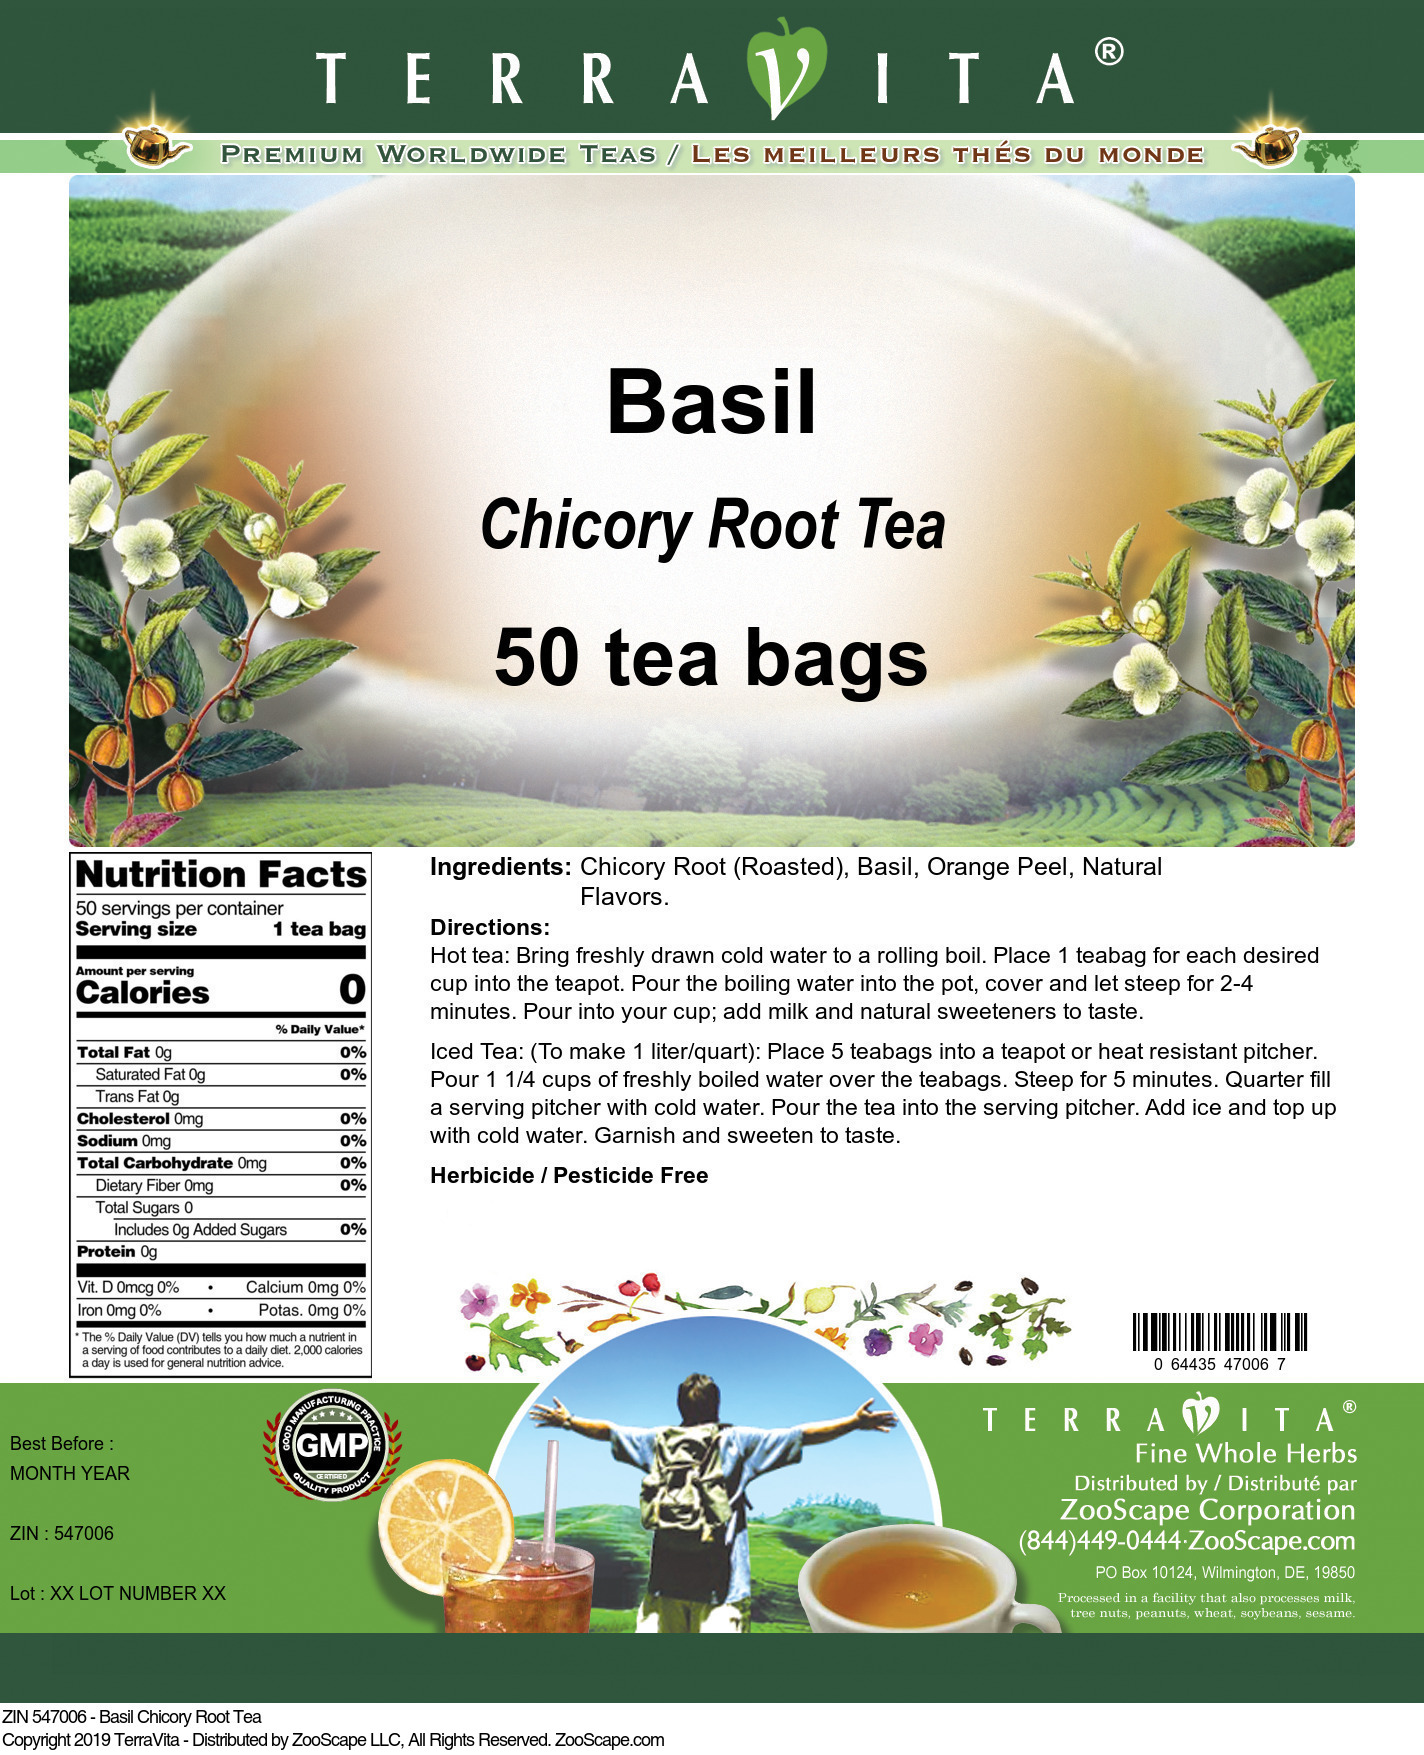 Basil Chicory Root